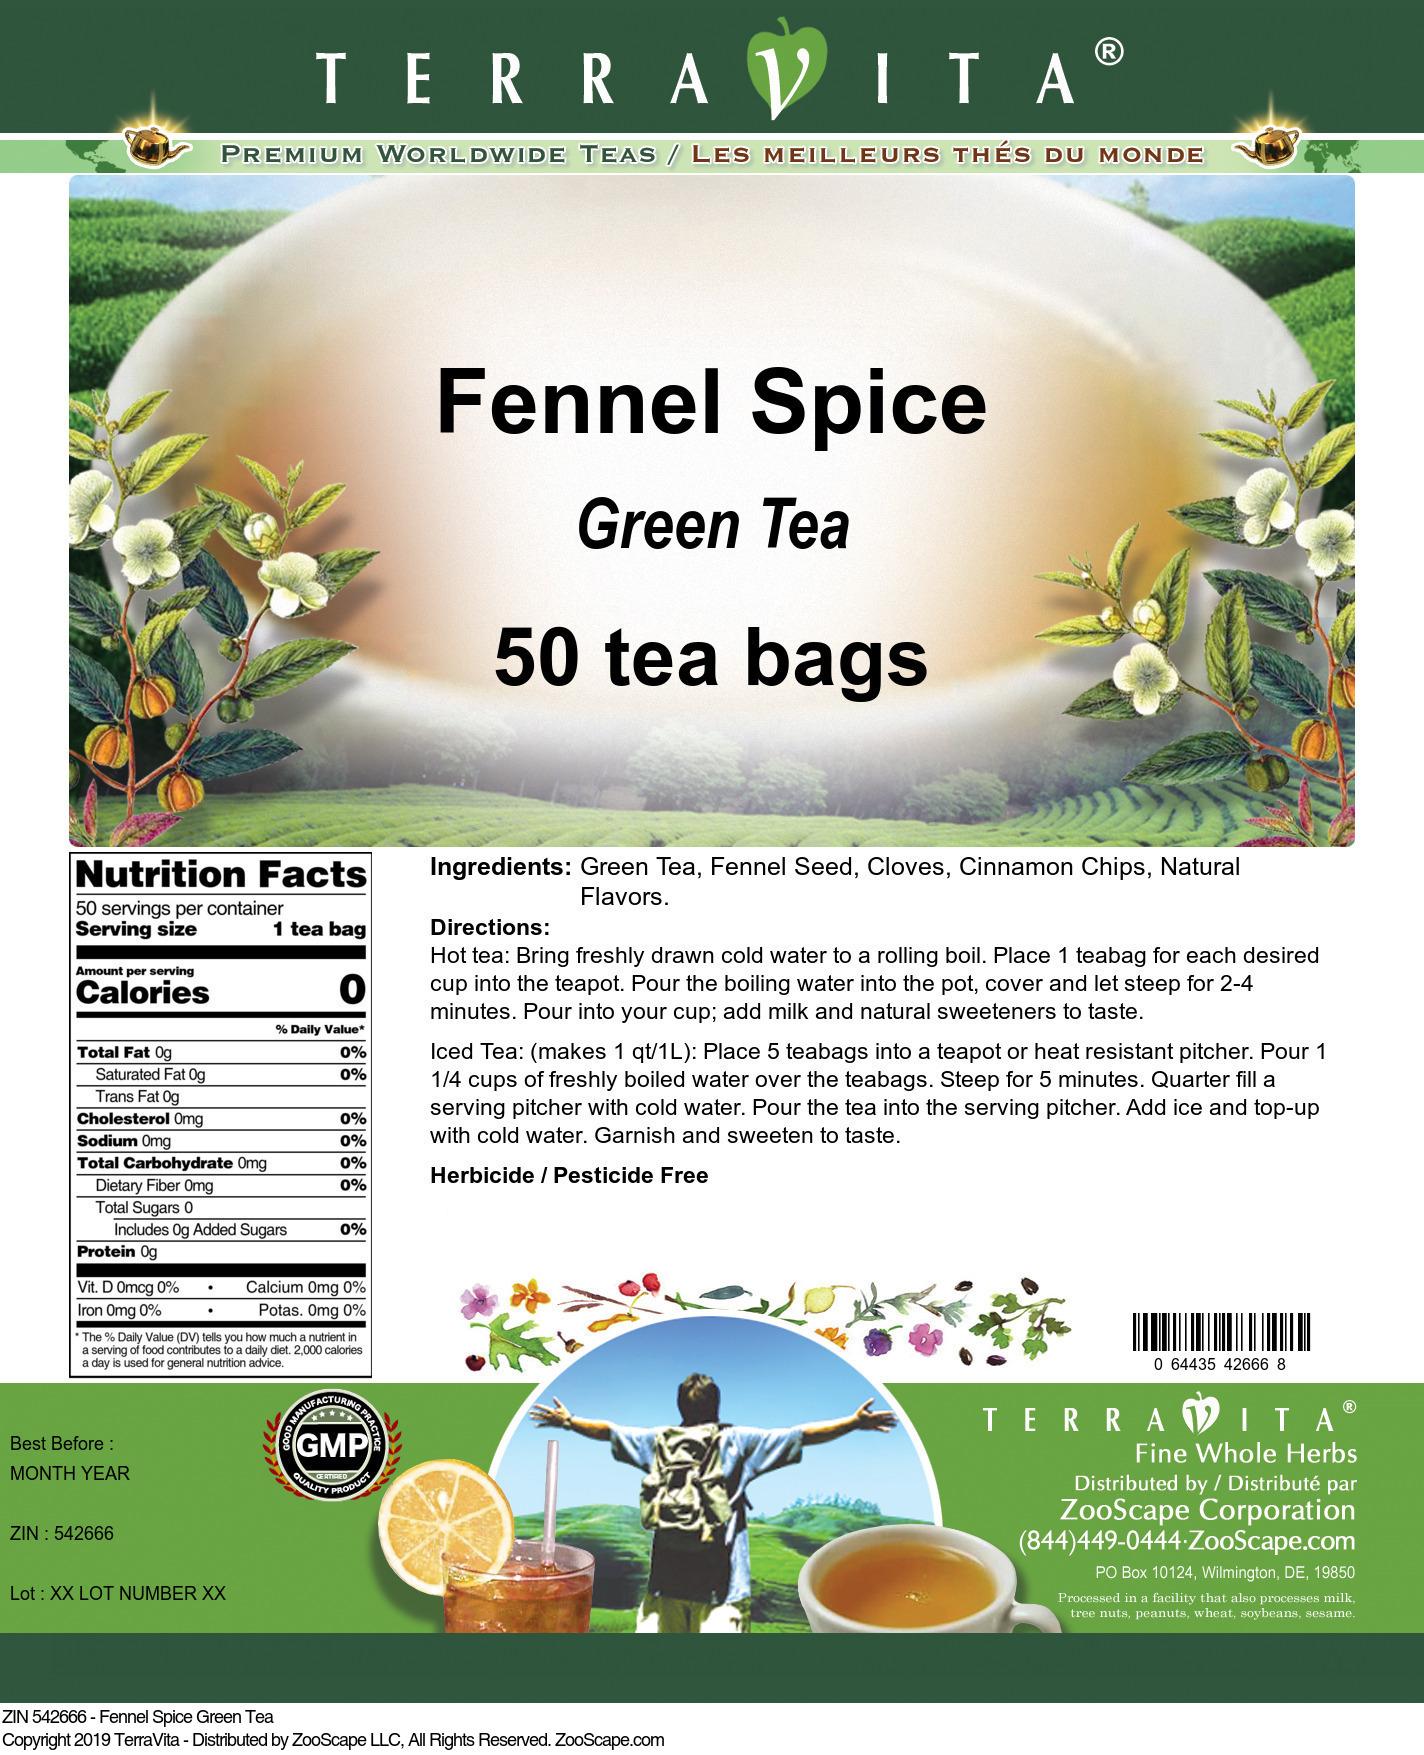 Fennel Spice Green Tea